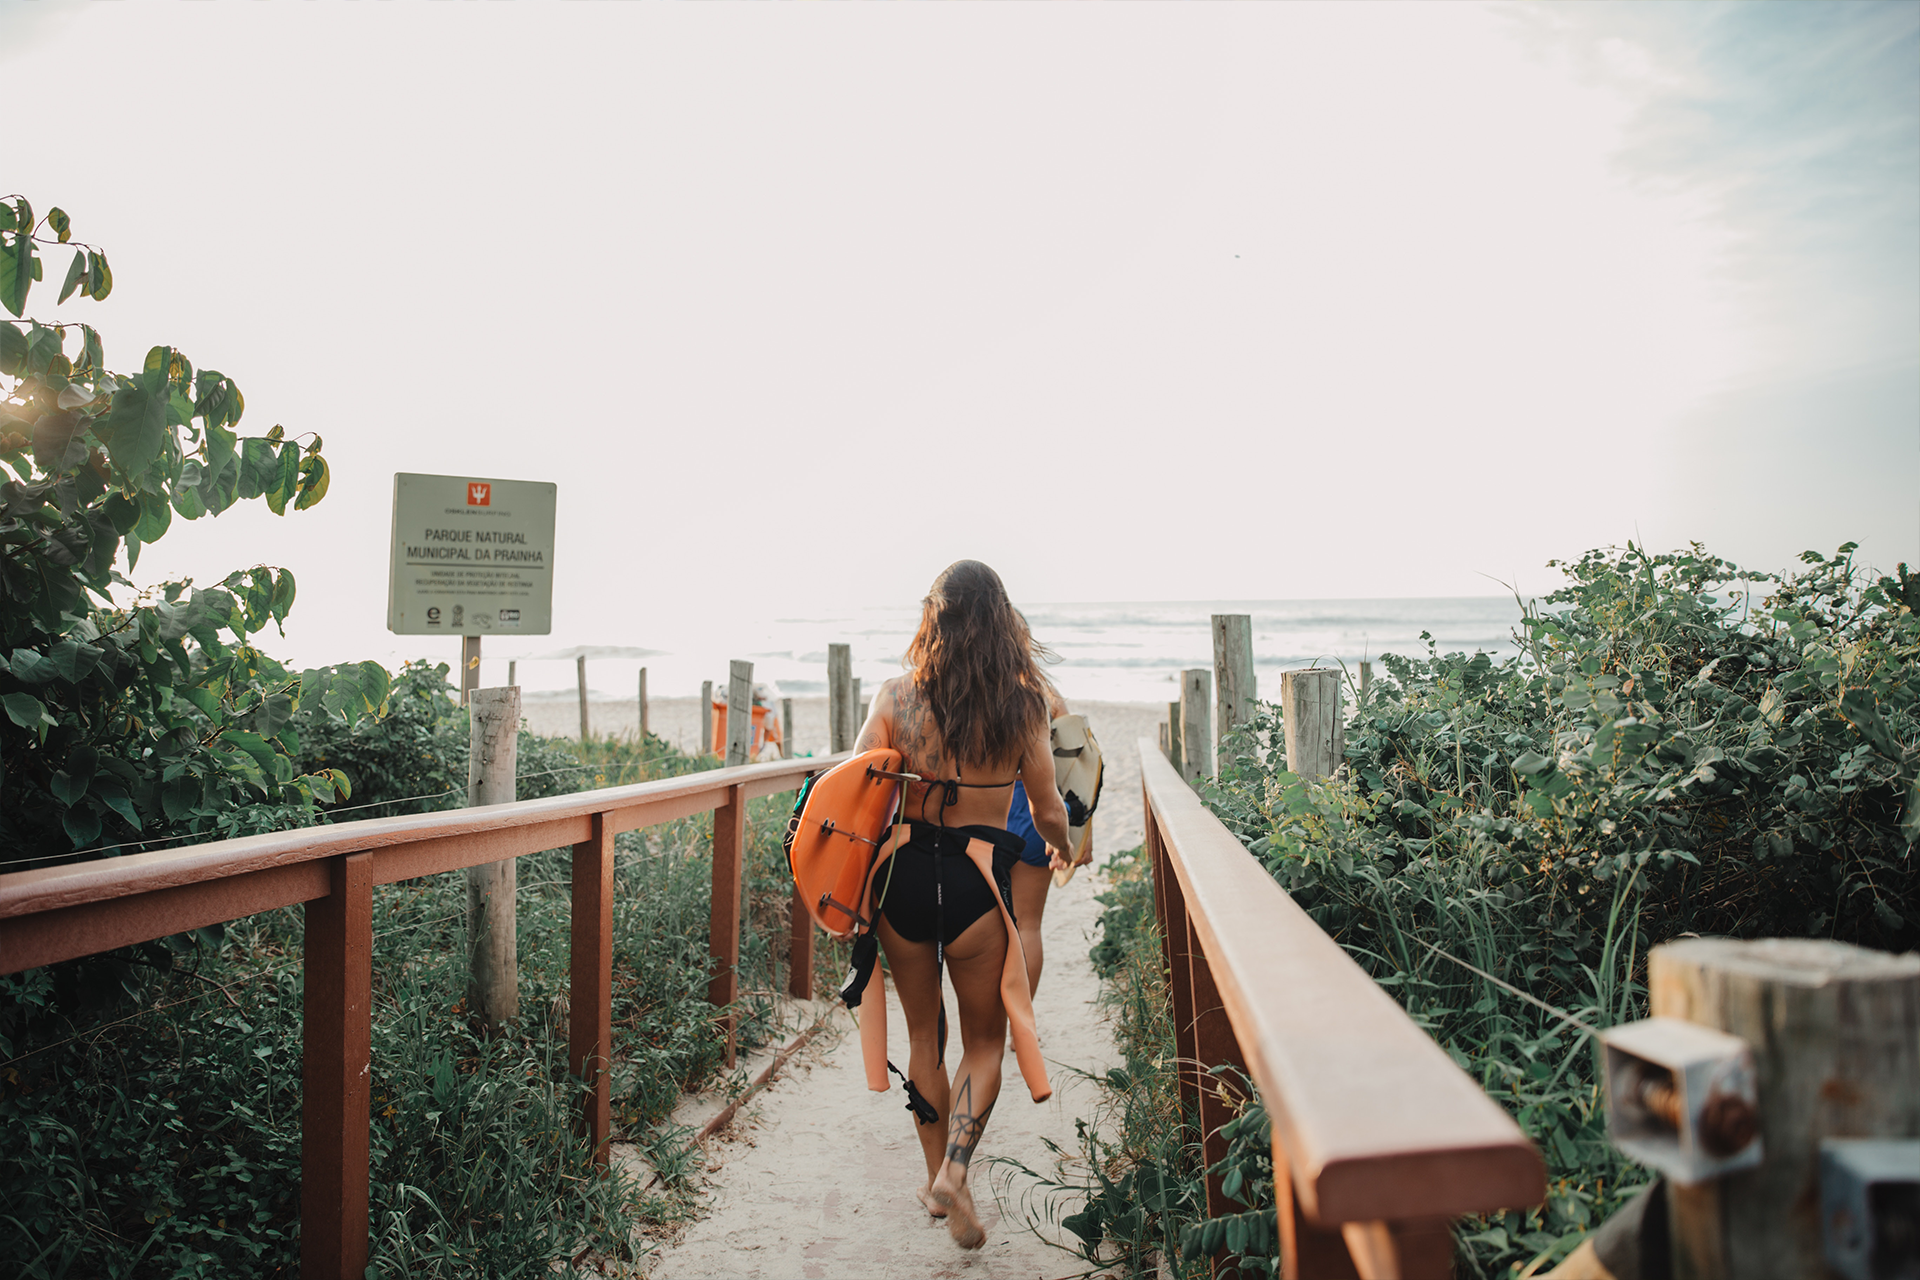 surf-praia-rio-de-janeiro-brasil